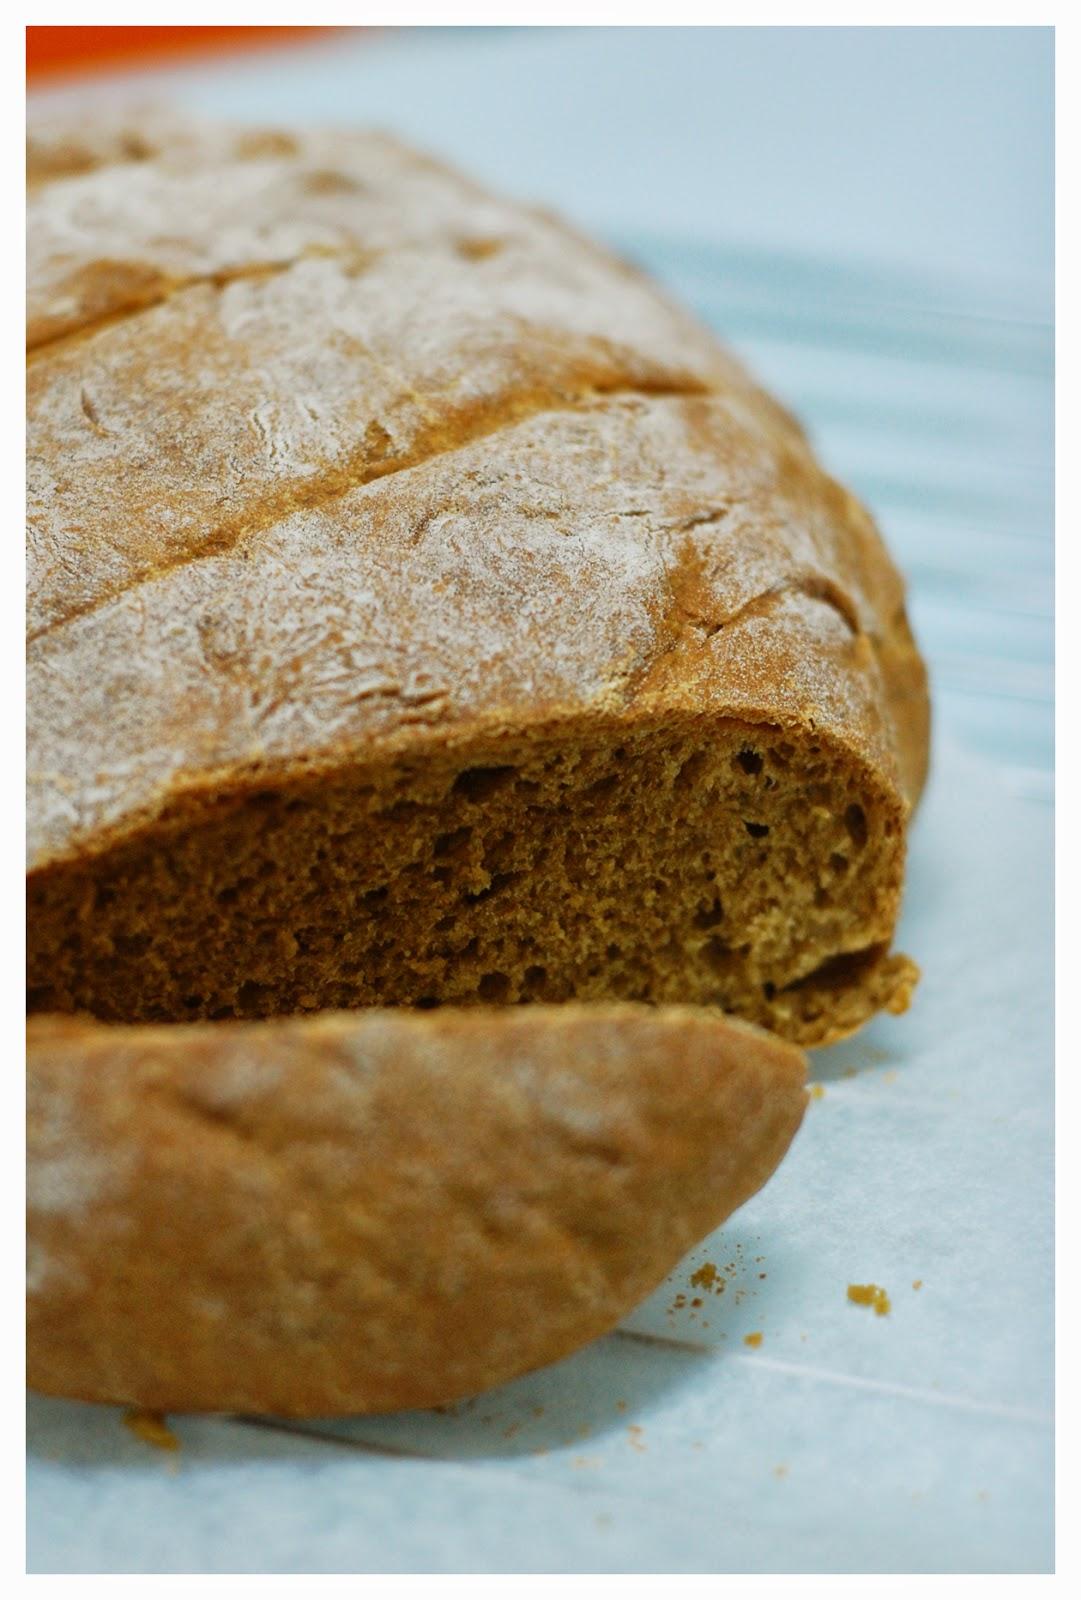 Coffee & Bread: Homemade organic oatmeal brown bread